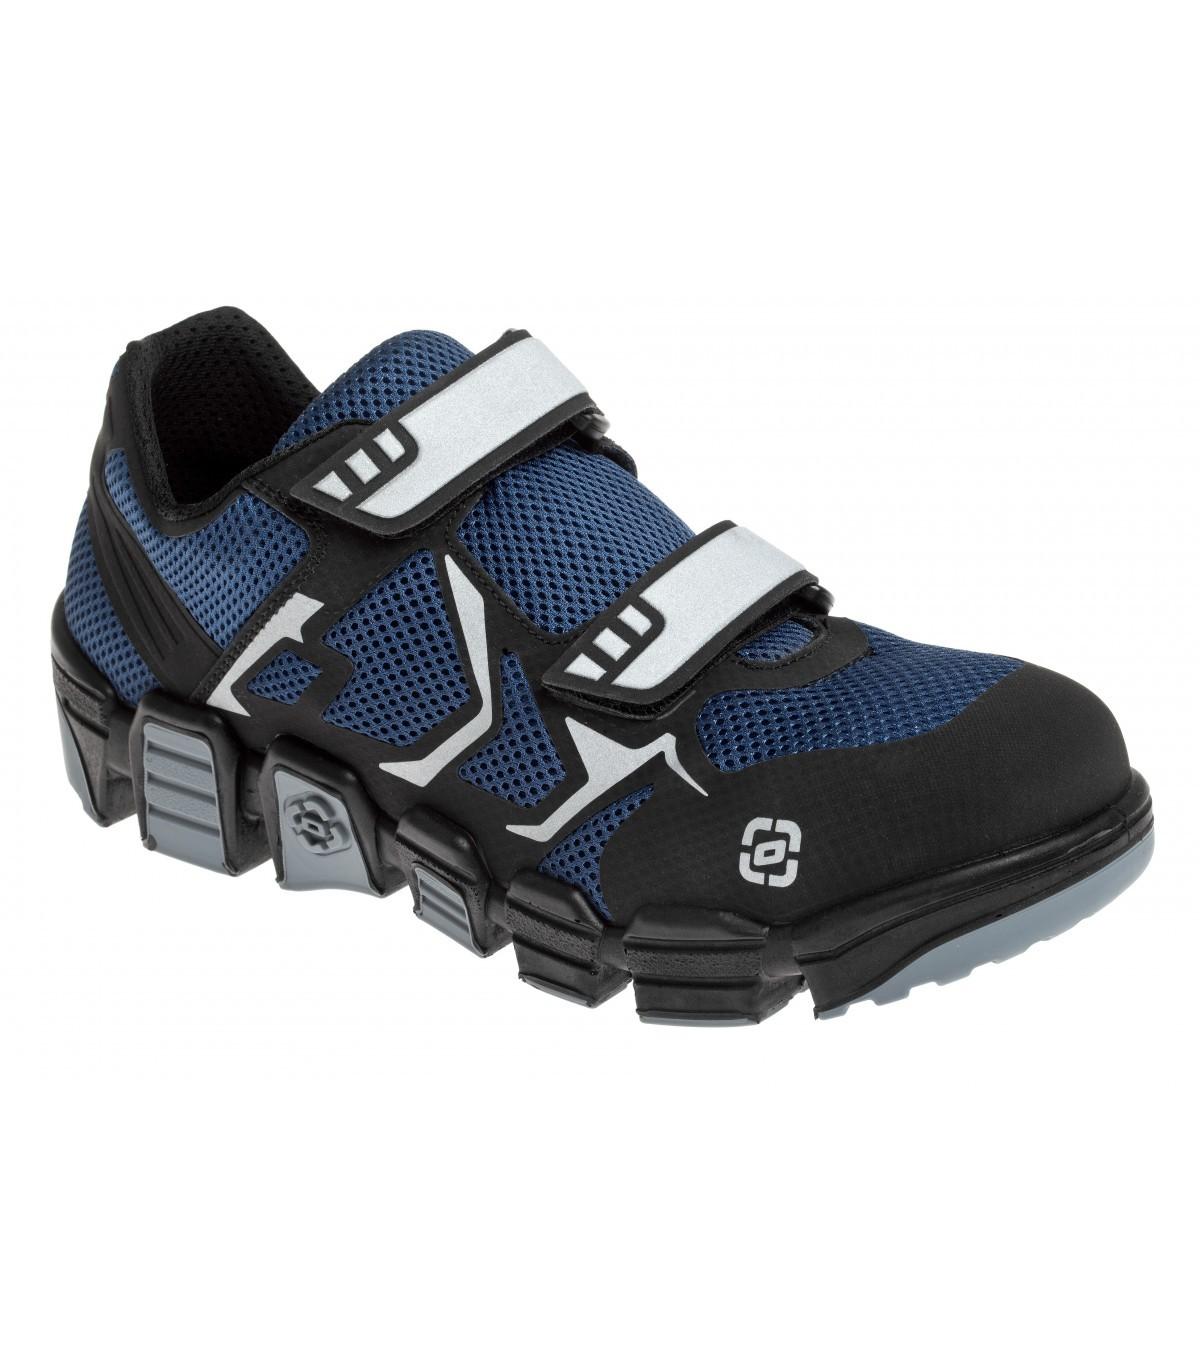 Extra vzdušná obuv BOIGA S1 modrá d7868c220b